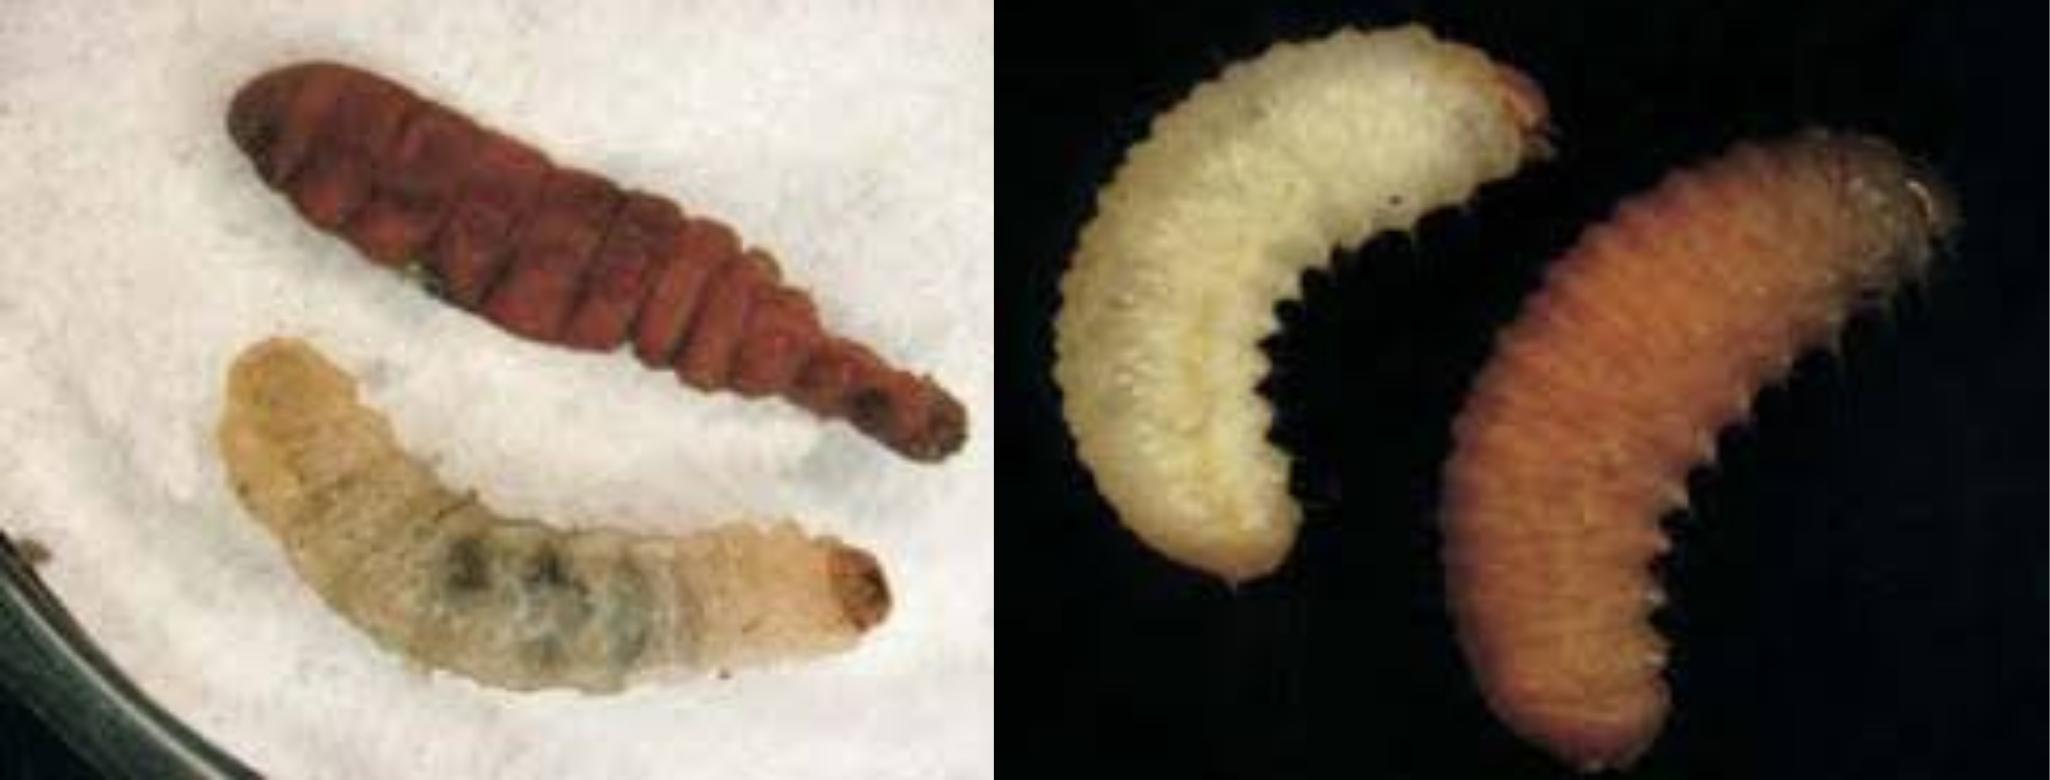 Larvas de Cydia splendana y Curculio elephas parasitadas por nematodos entomopatógenos. Fuente: Estación Fitopatolóxica do Areeiro; Ensayo de eficacia con nematodos entomopatógenos para el control de carpófagos del castaño